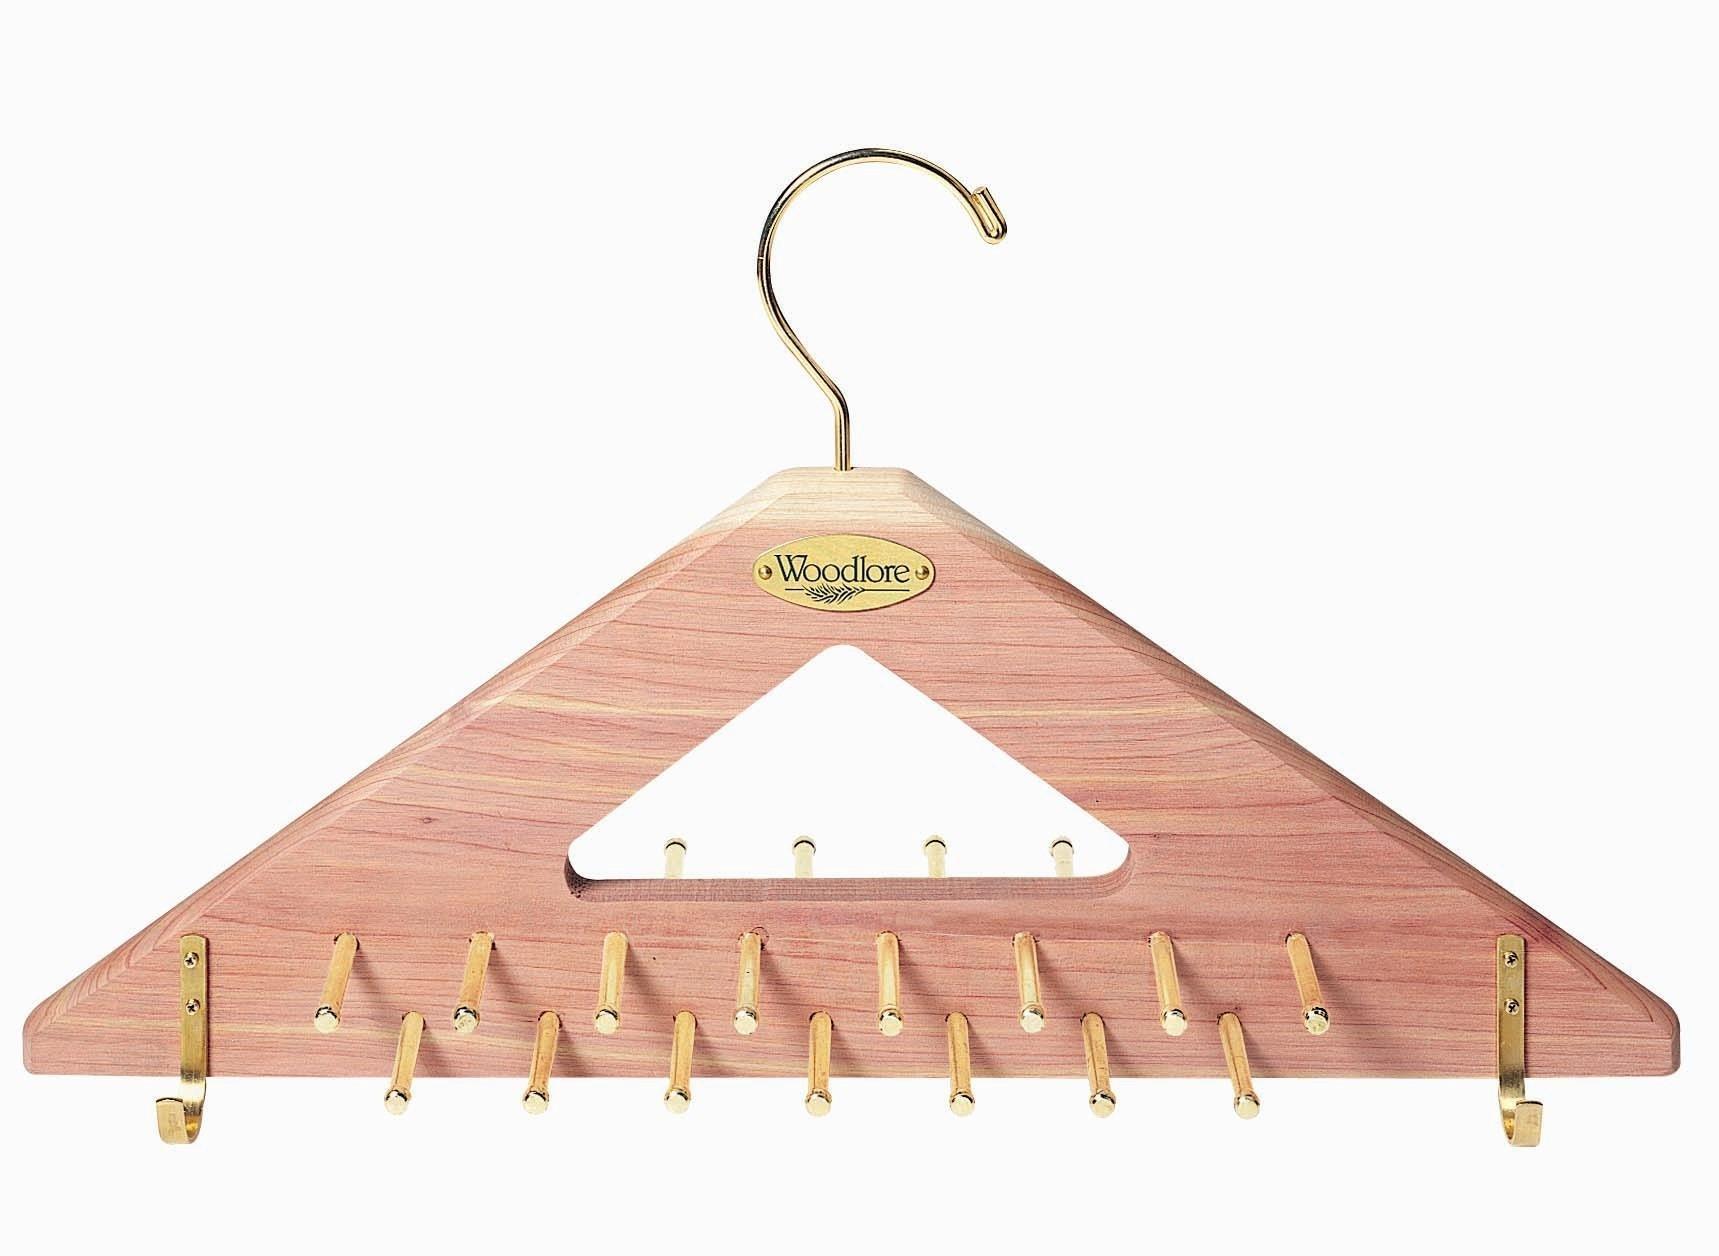 Woodlore Closets Natural Fresh Aromatic Cedar Tie & Belt Hanger by Woodlore